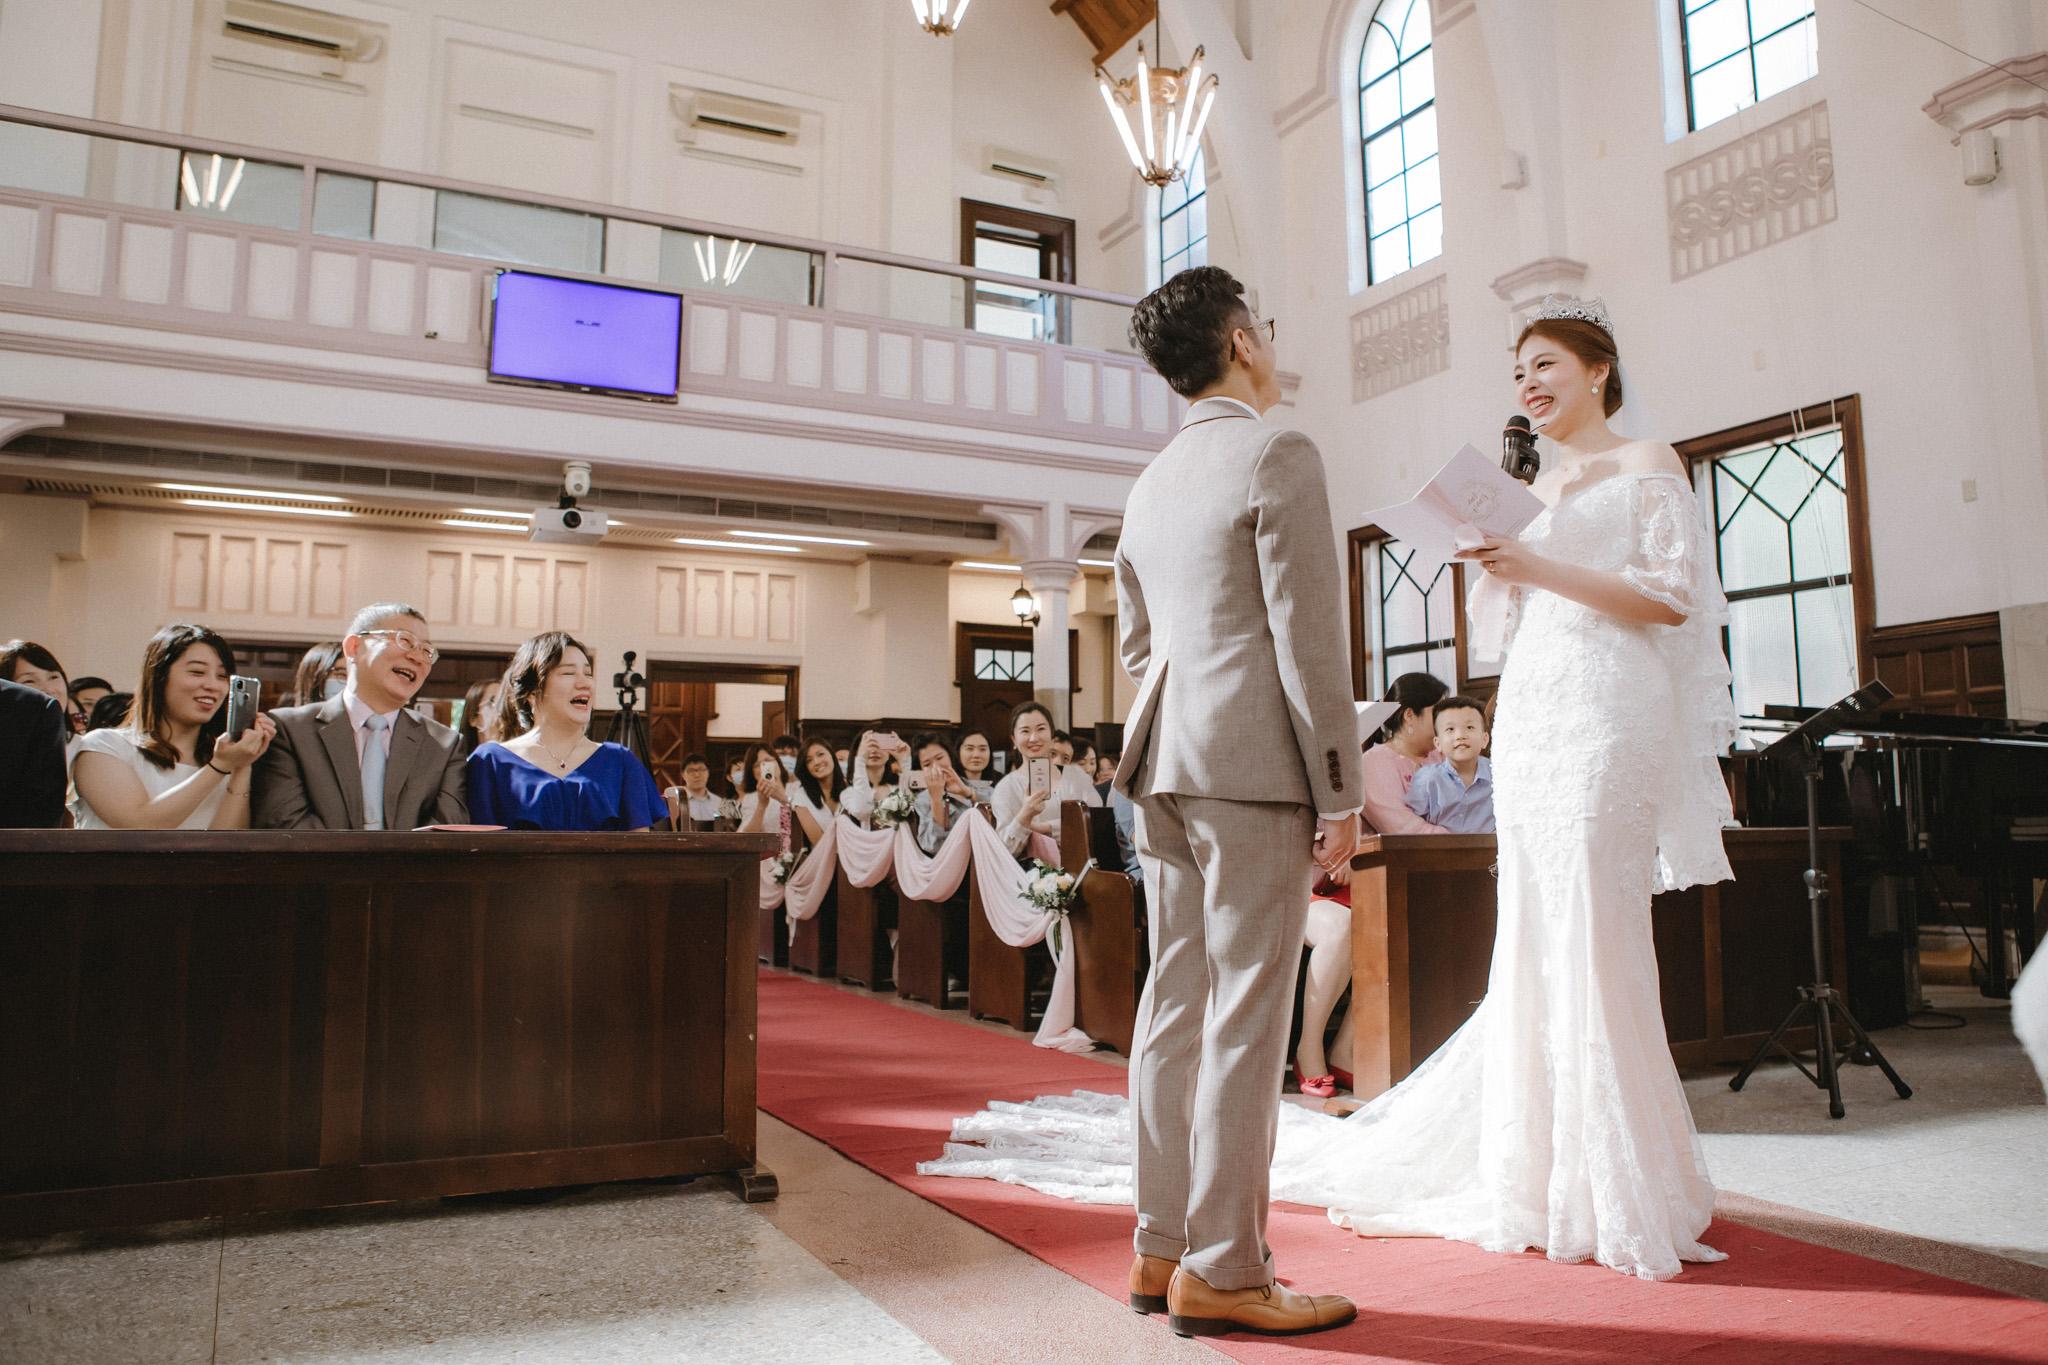 EW 台北婚攝 居米 濟南教會 Brick Yard 33 美軍俱樂部 婚禮 婚宴-38